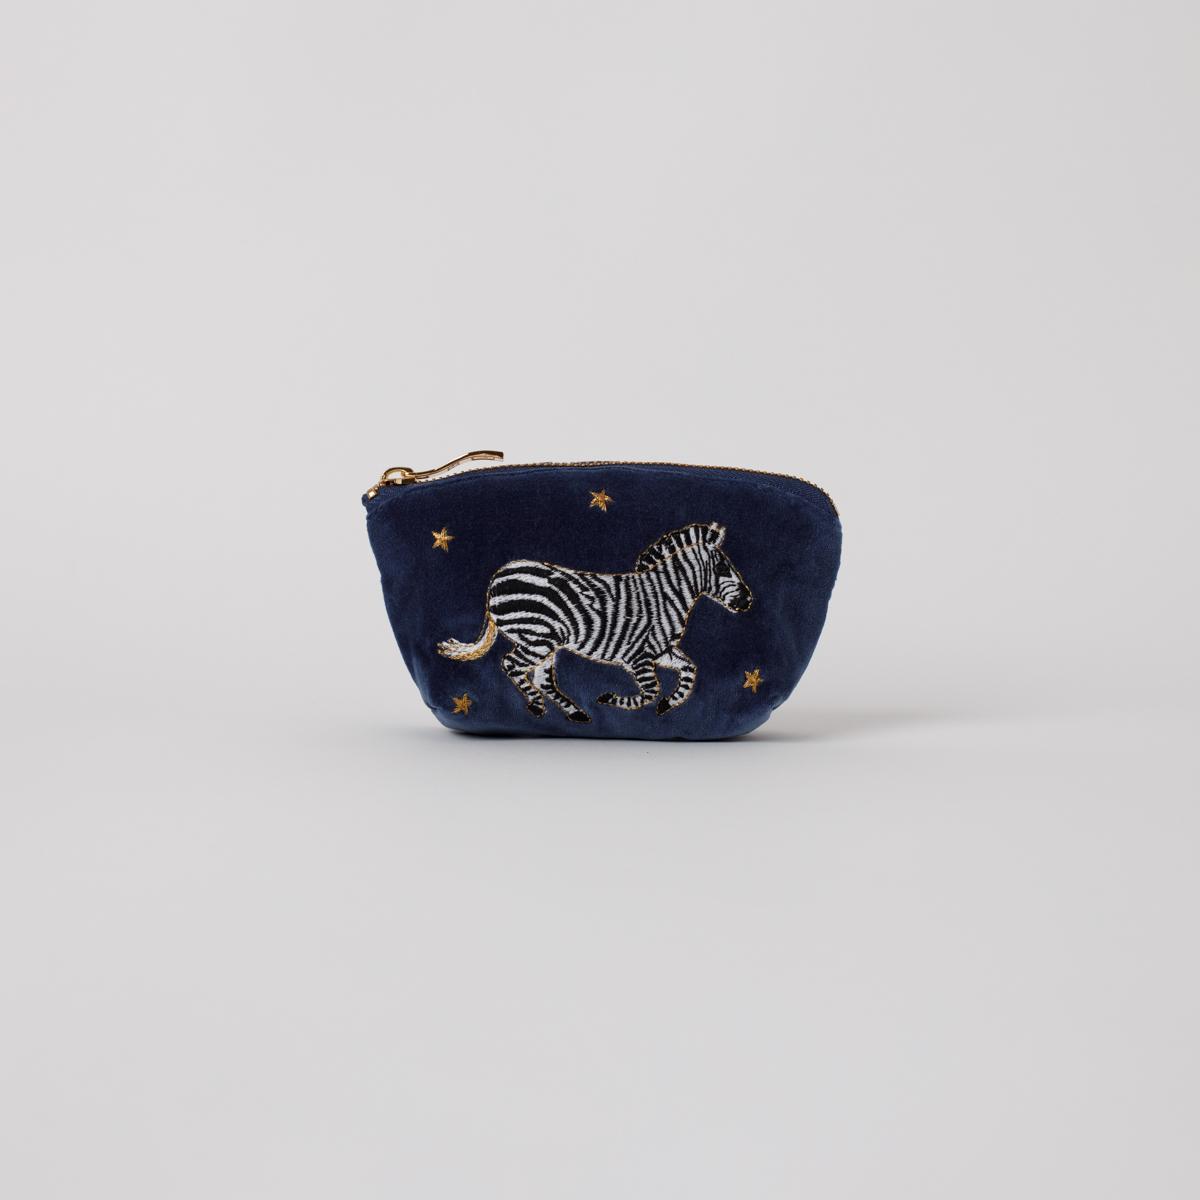 Elizabeth Scarlett - Coin Purse Zebra Indigo Velvet